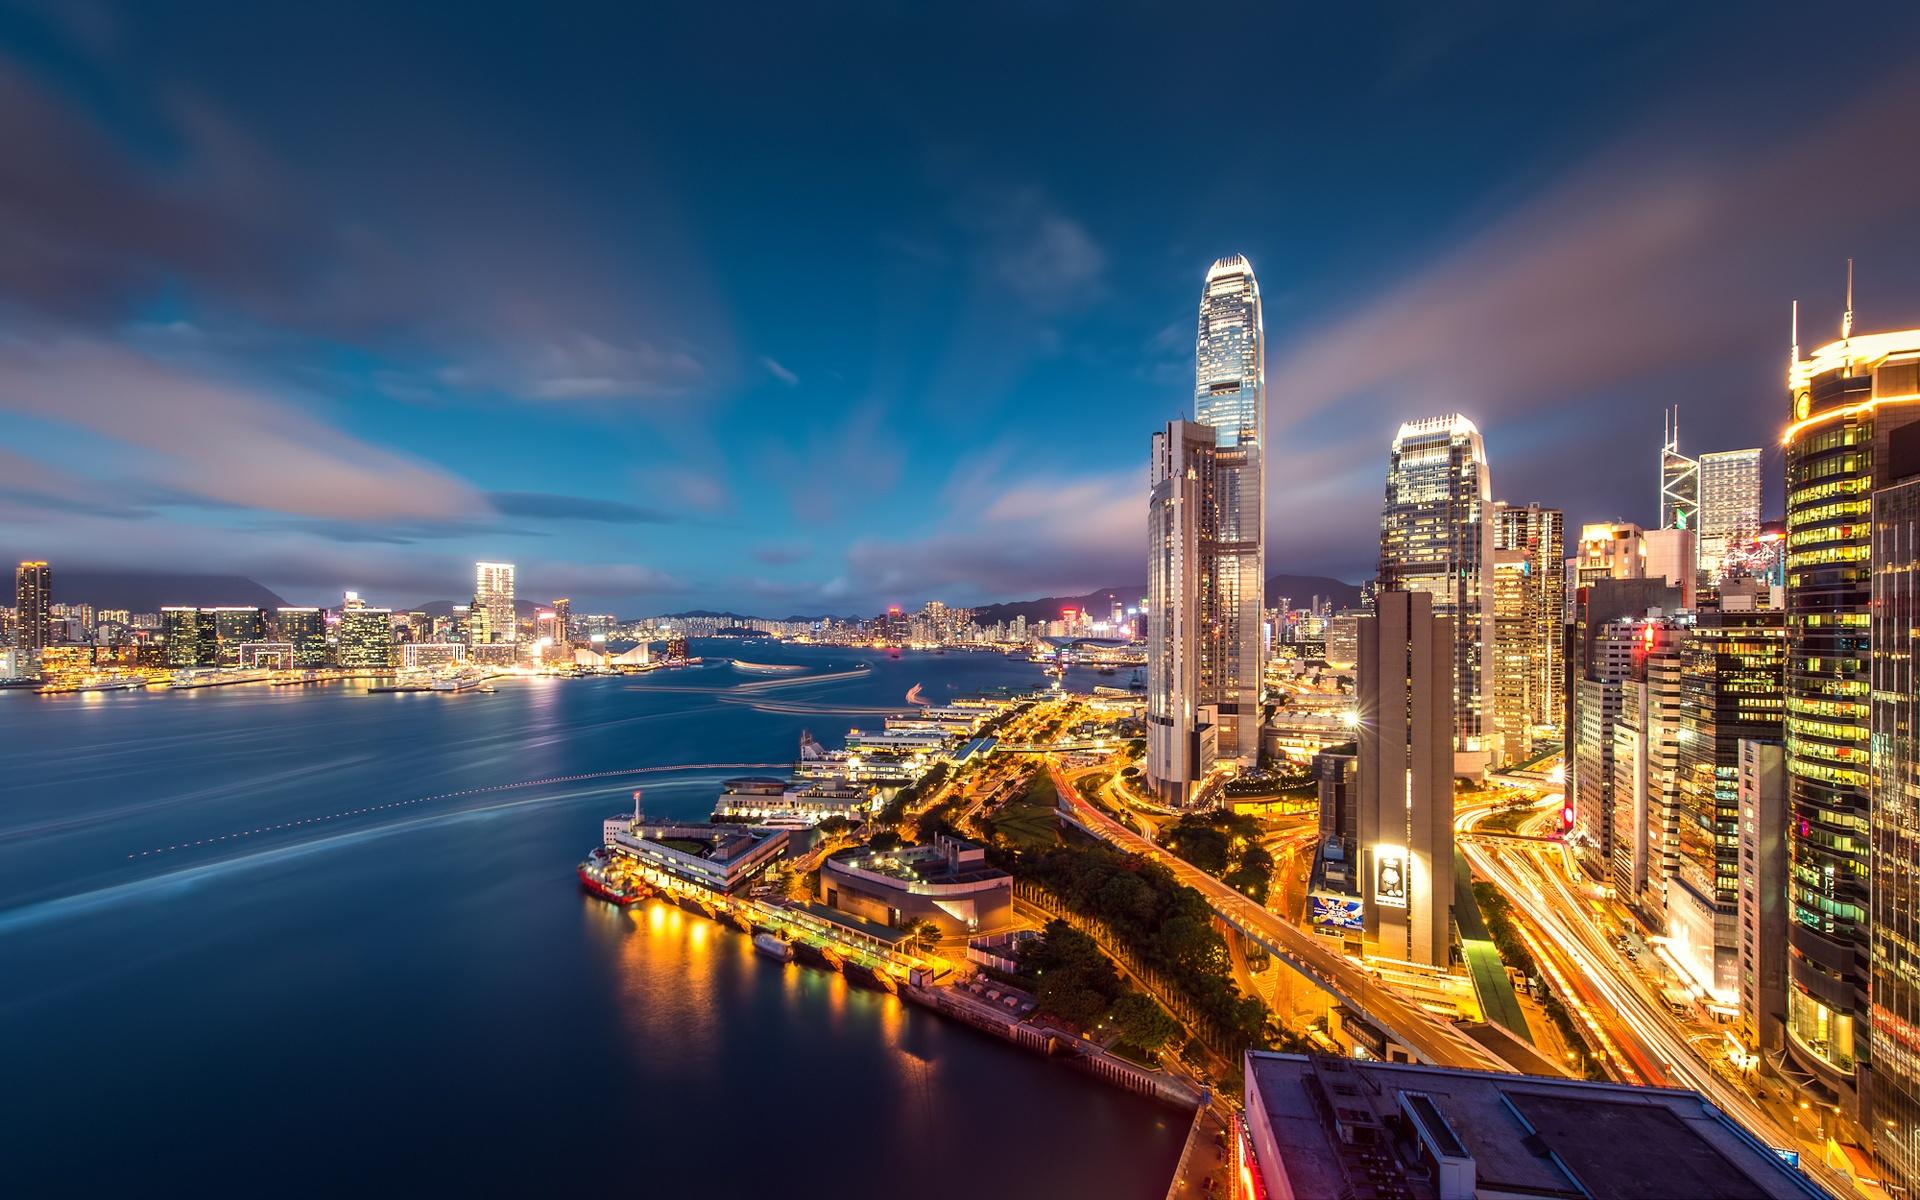 Wallpaper Beautiful Night View Of Hong Kong 1920x1200 Hd Picture Image